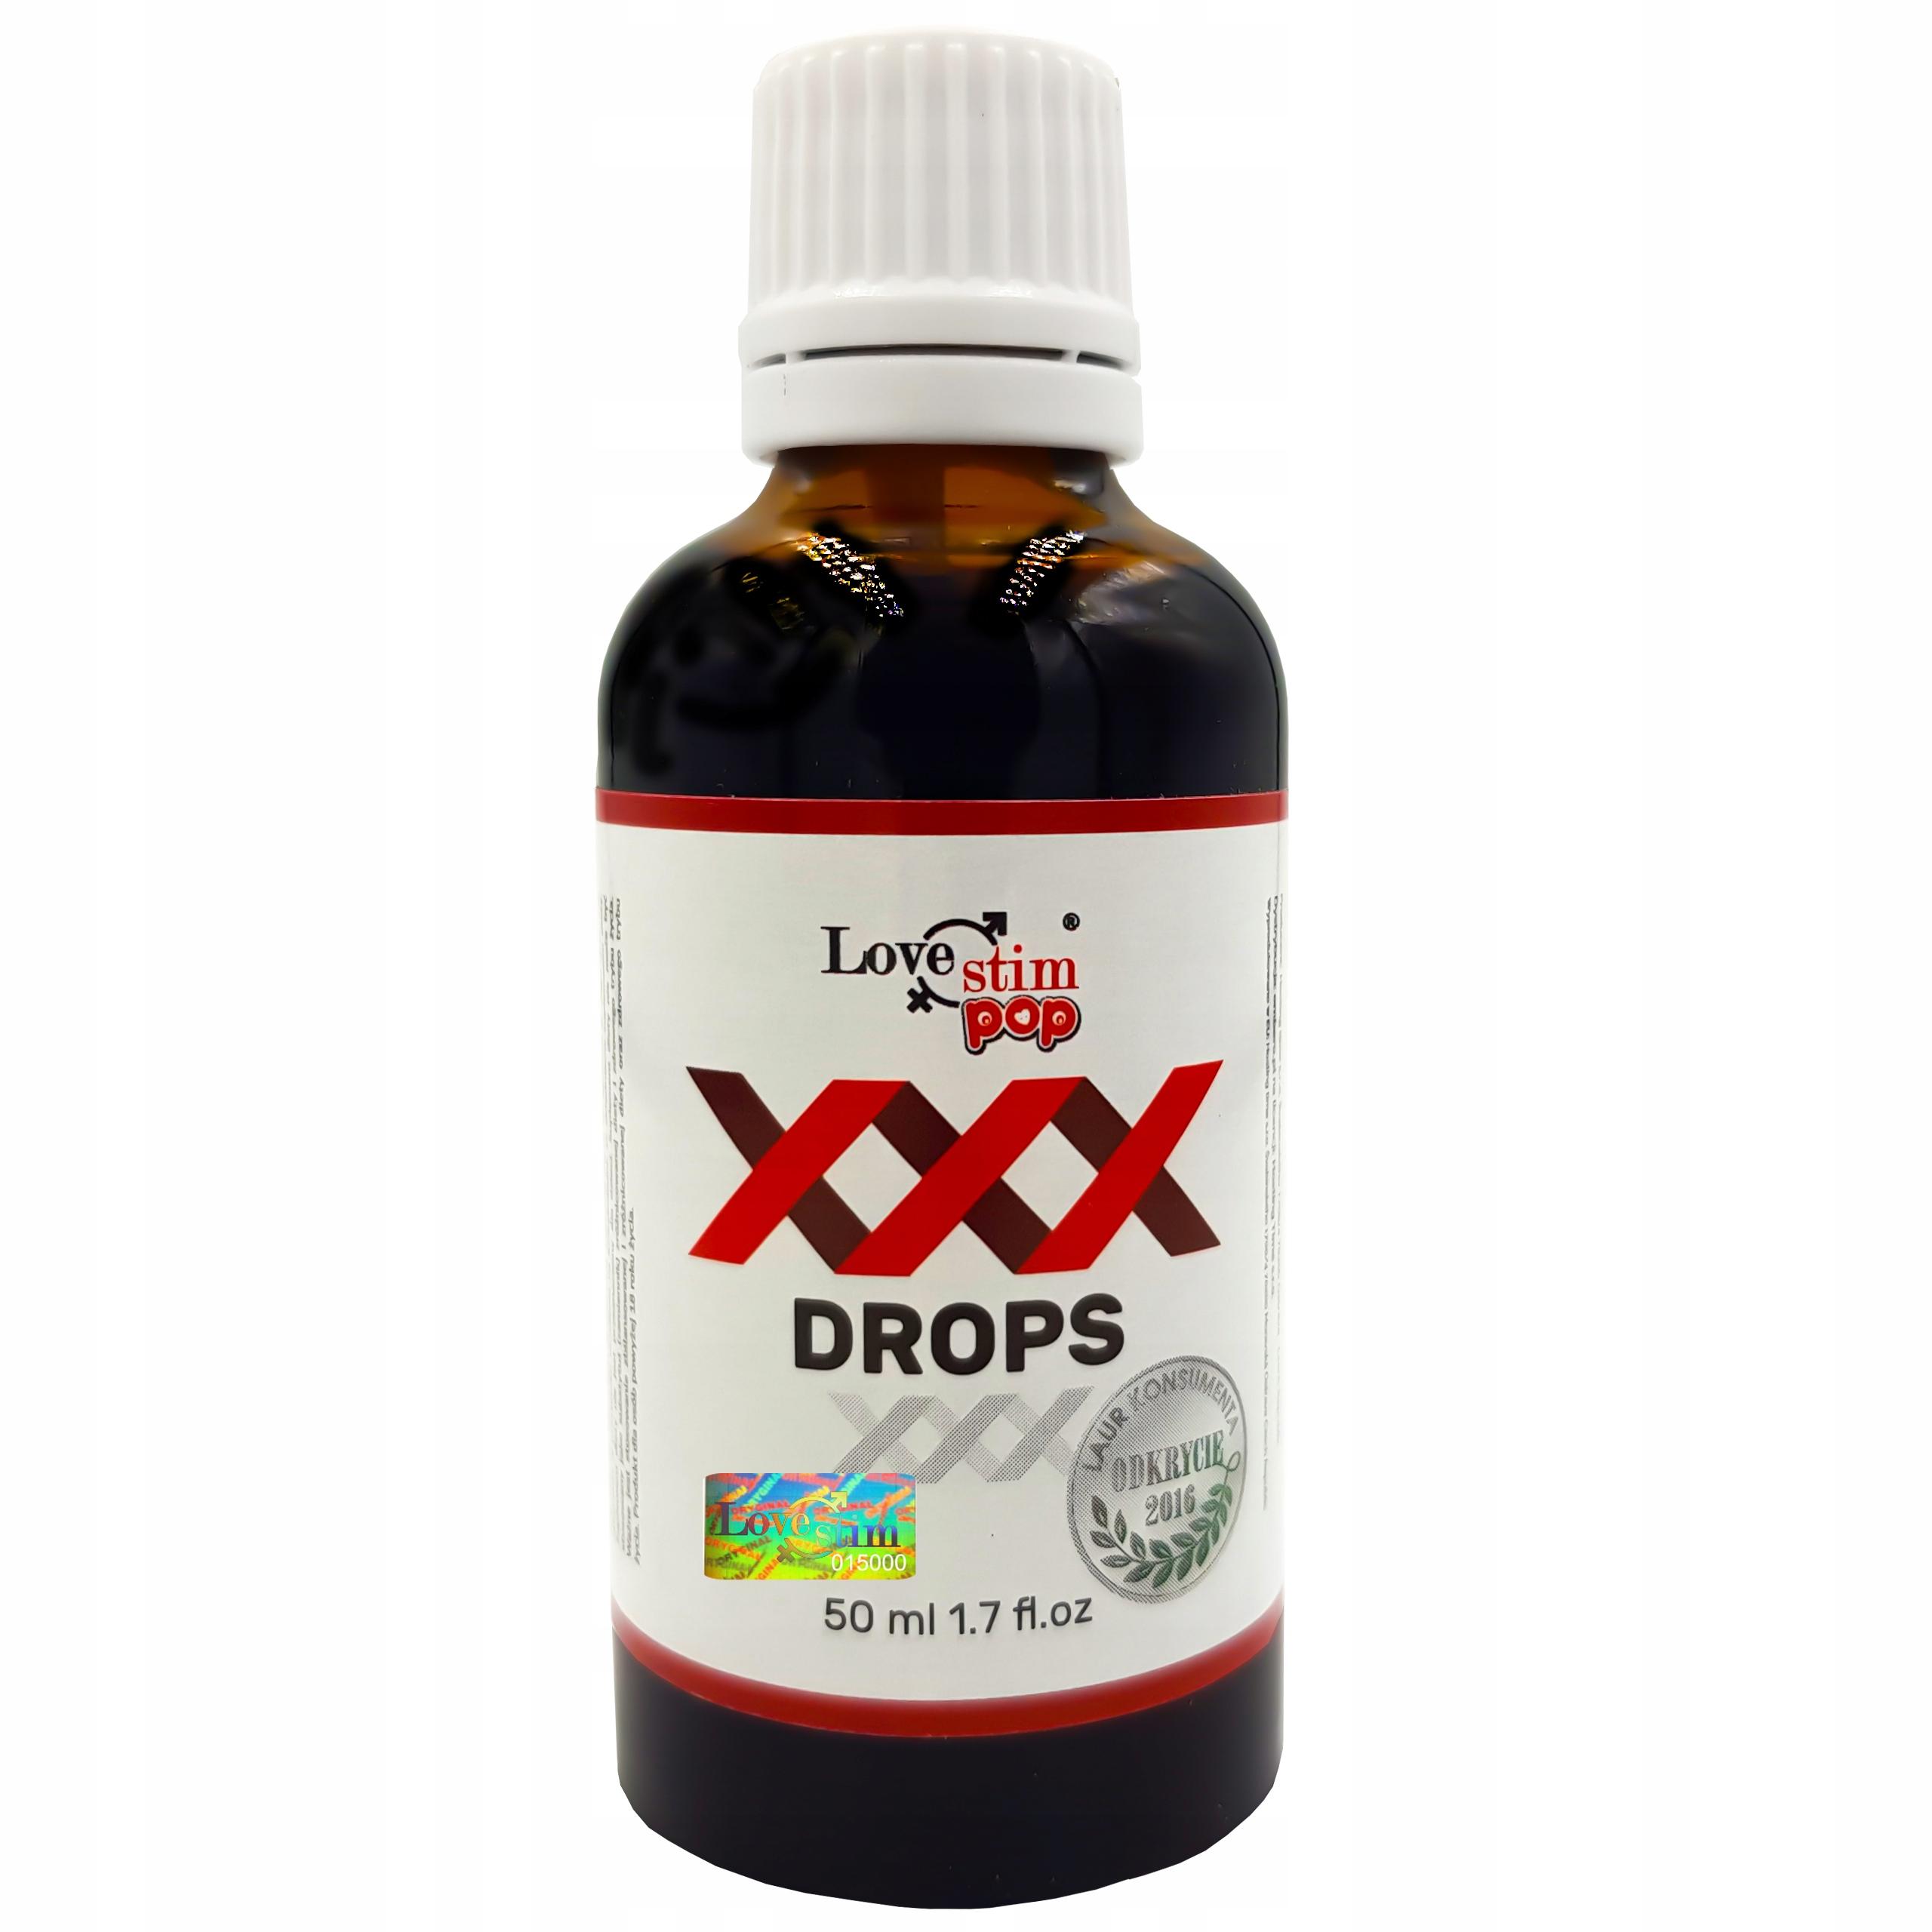 Item STRONG DROPS STIMULATING WOMEN XXX DROPS 50 ml